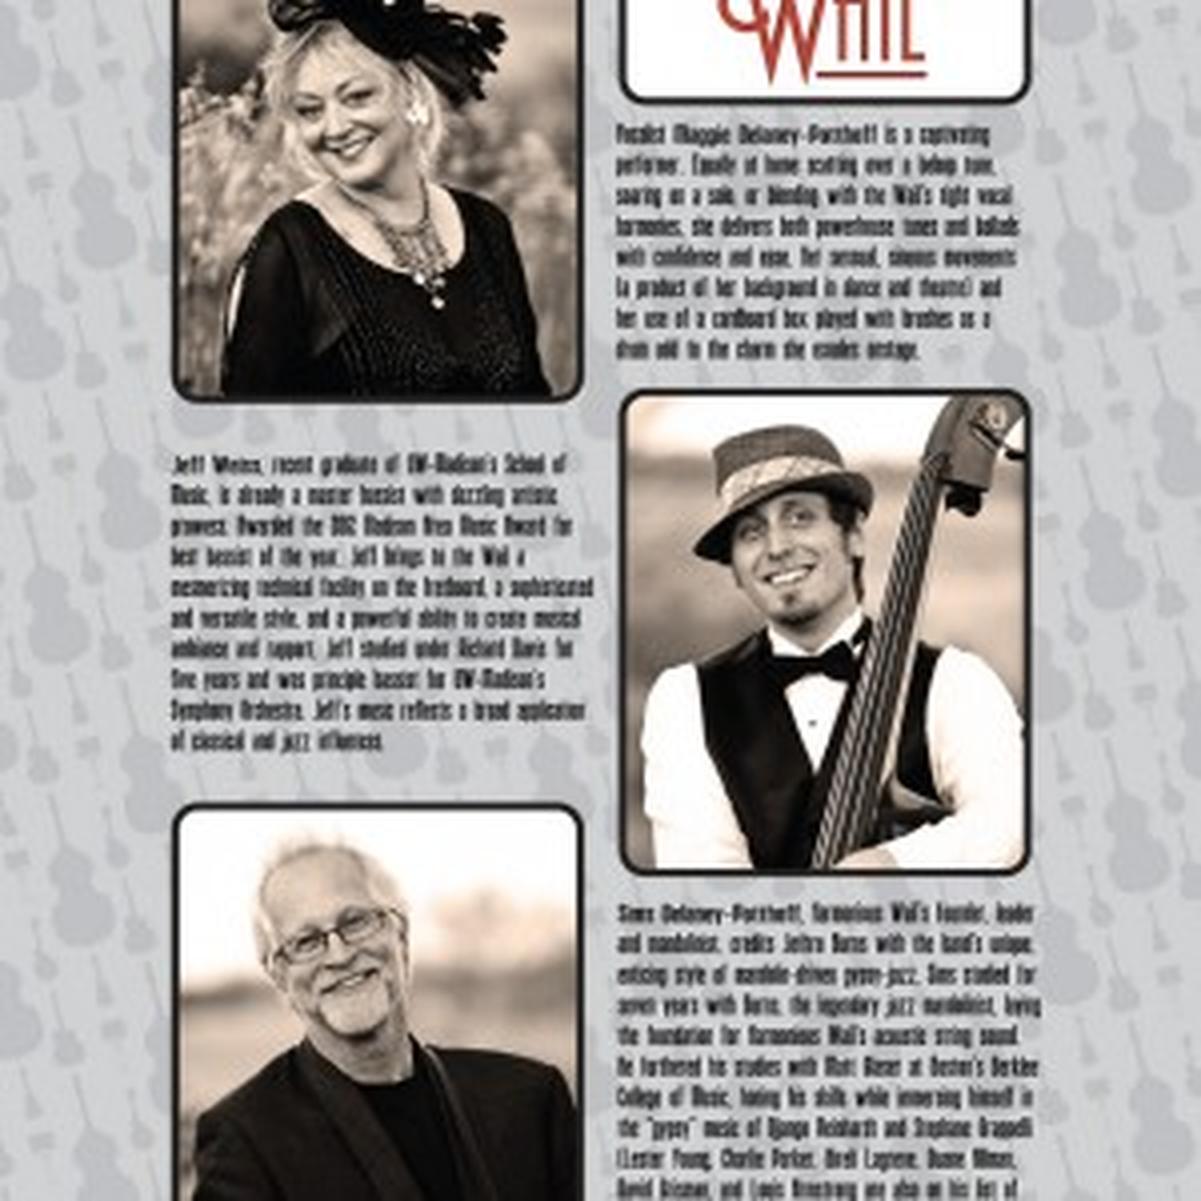 Harmonious Wail wiki, Harmonious Wail review, Harmonious Wail history, Harmonious Wail news